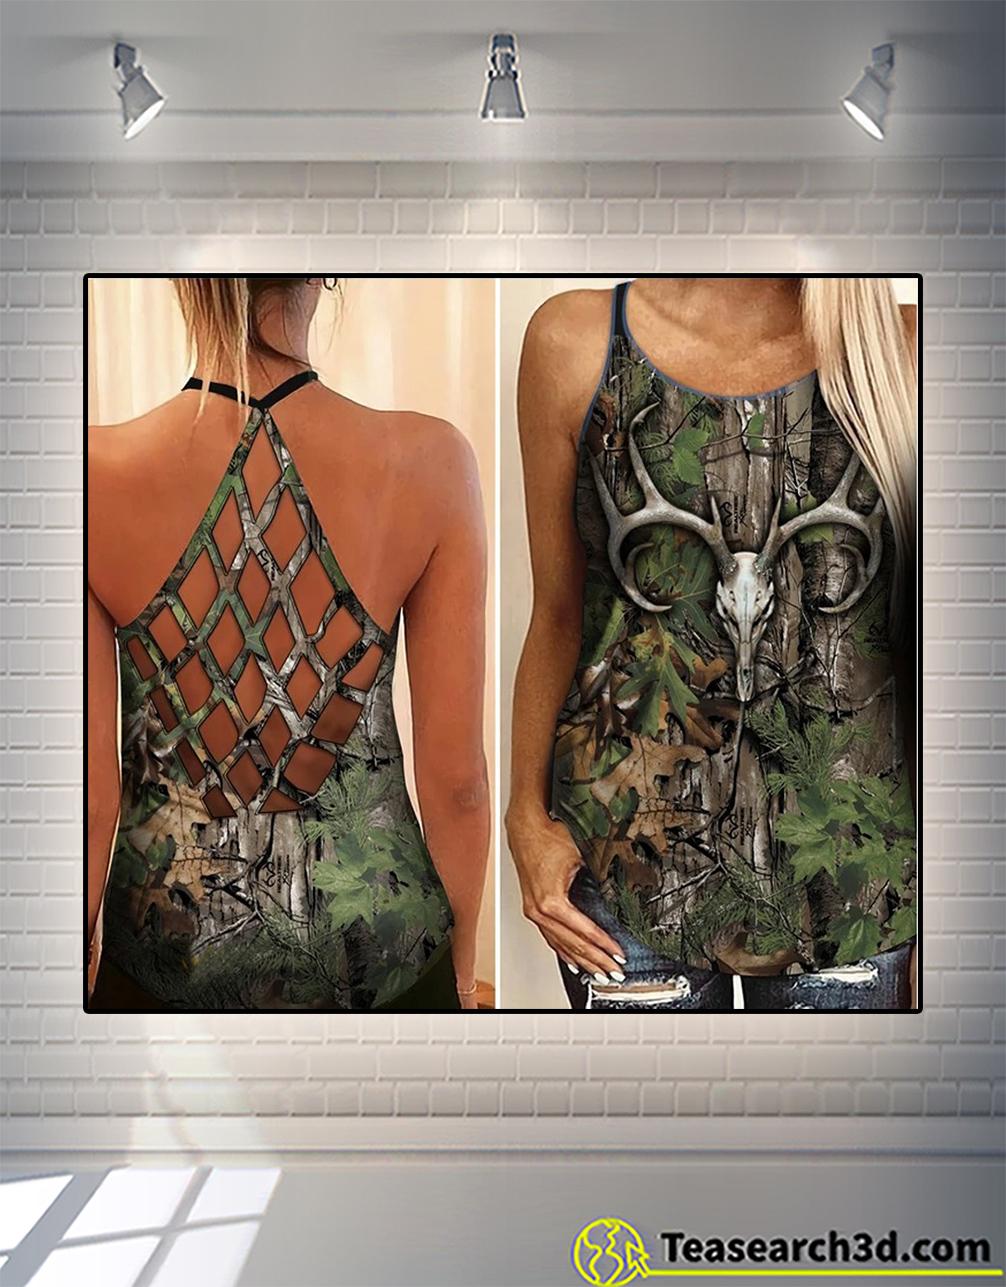 Hunting girl criss cross open back tank top